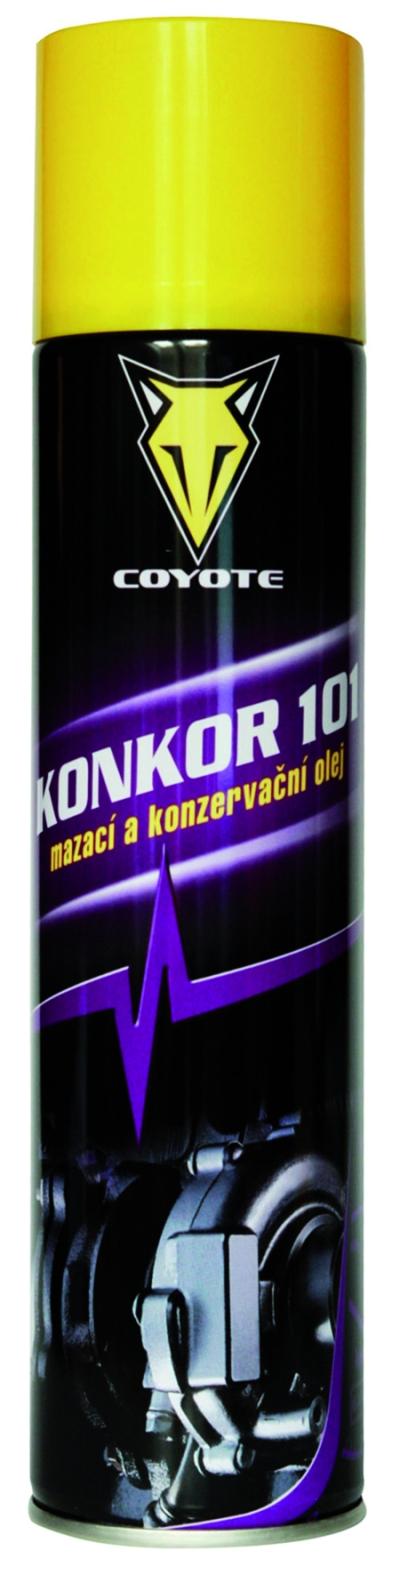 Konkor 101 olej 400 ml - 5033